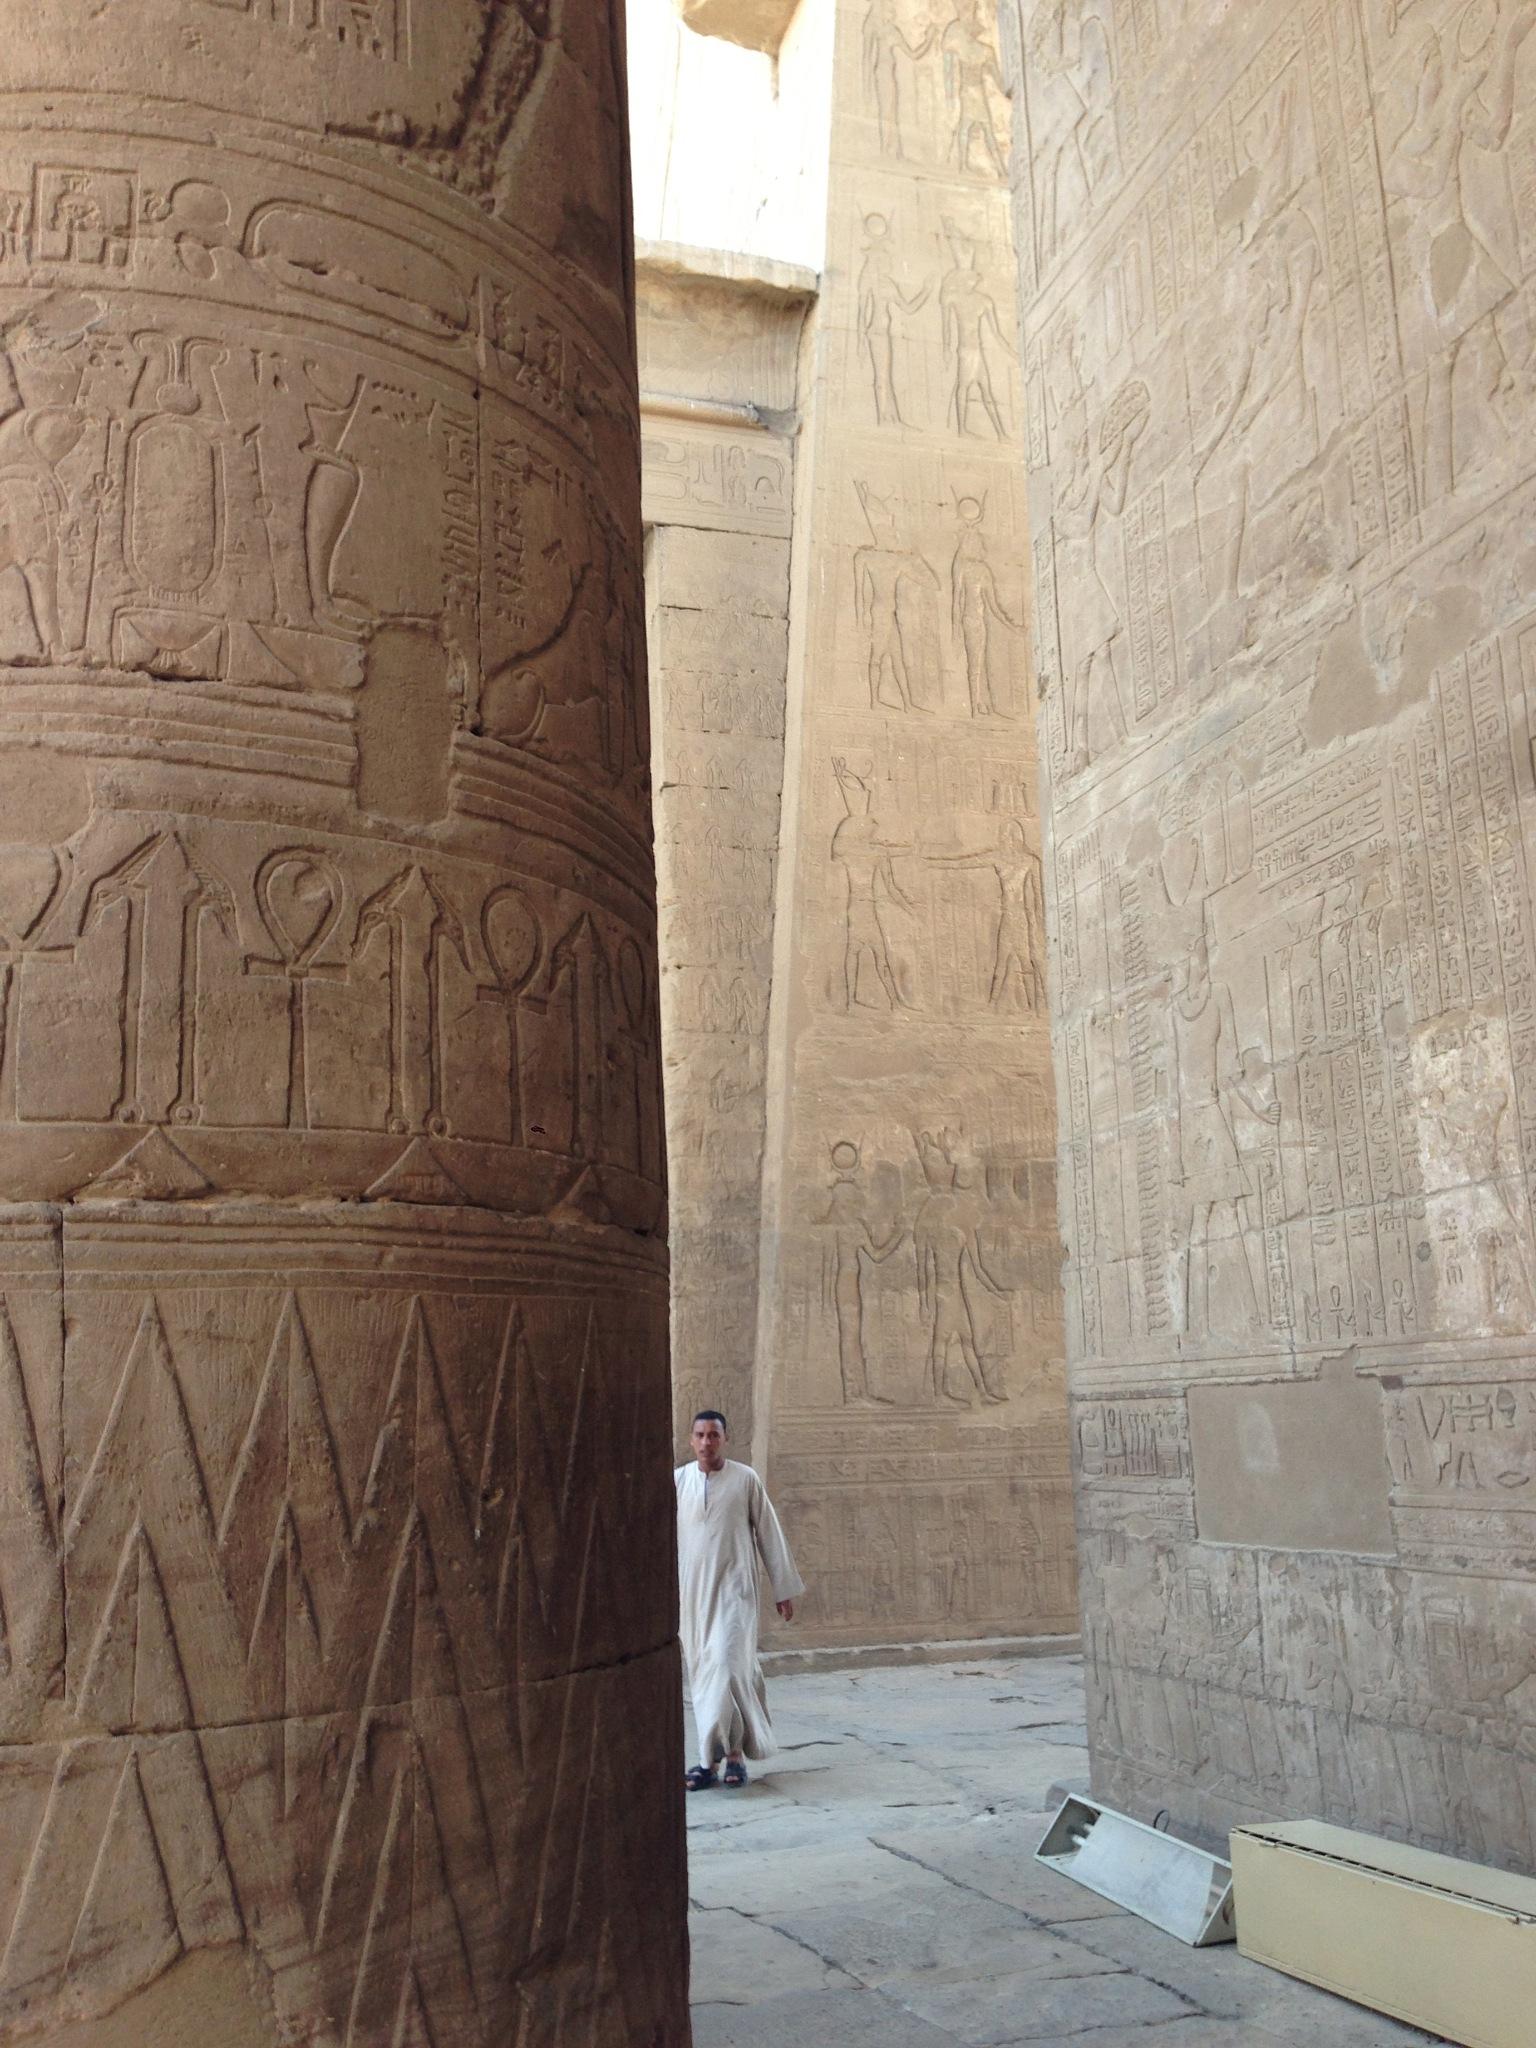 Temple in Egypt by LordJohan58